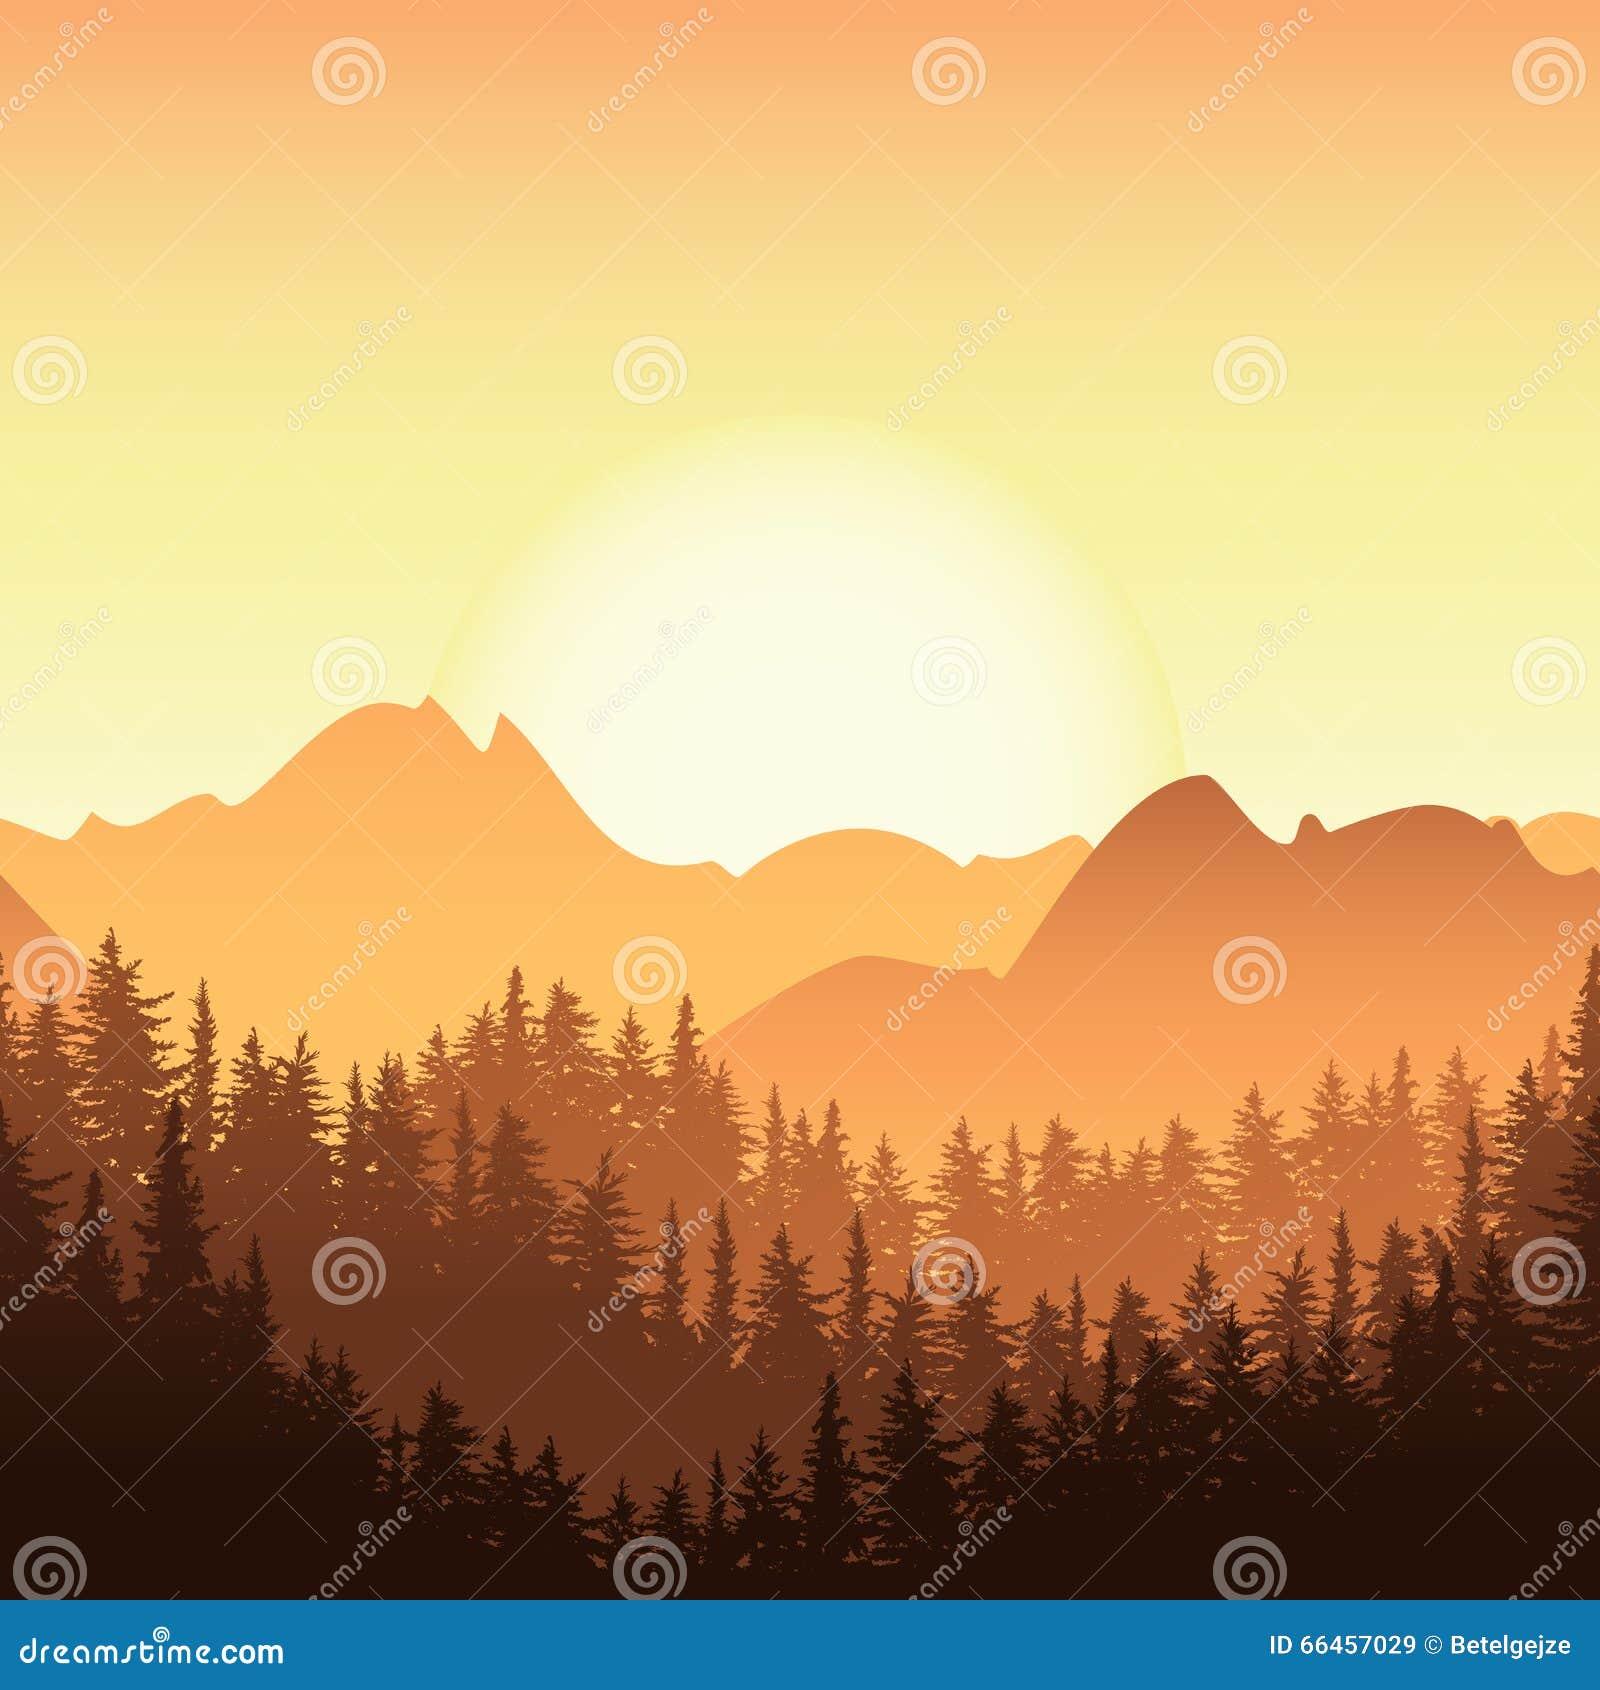 Landscape Illustration Vector Free: Vector Mountain Sunrise Landscape Royalty-Free Stock Photo